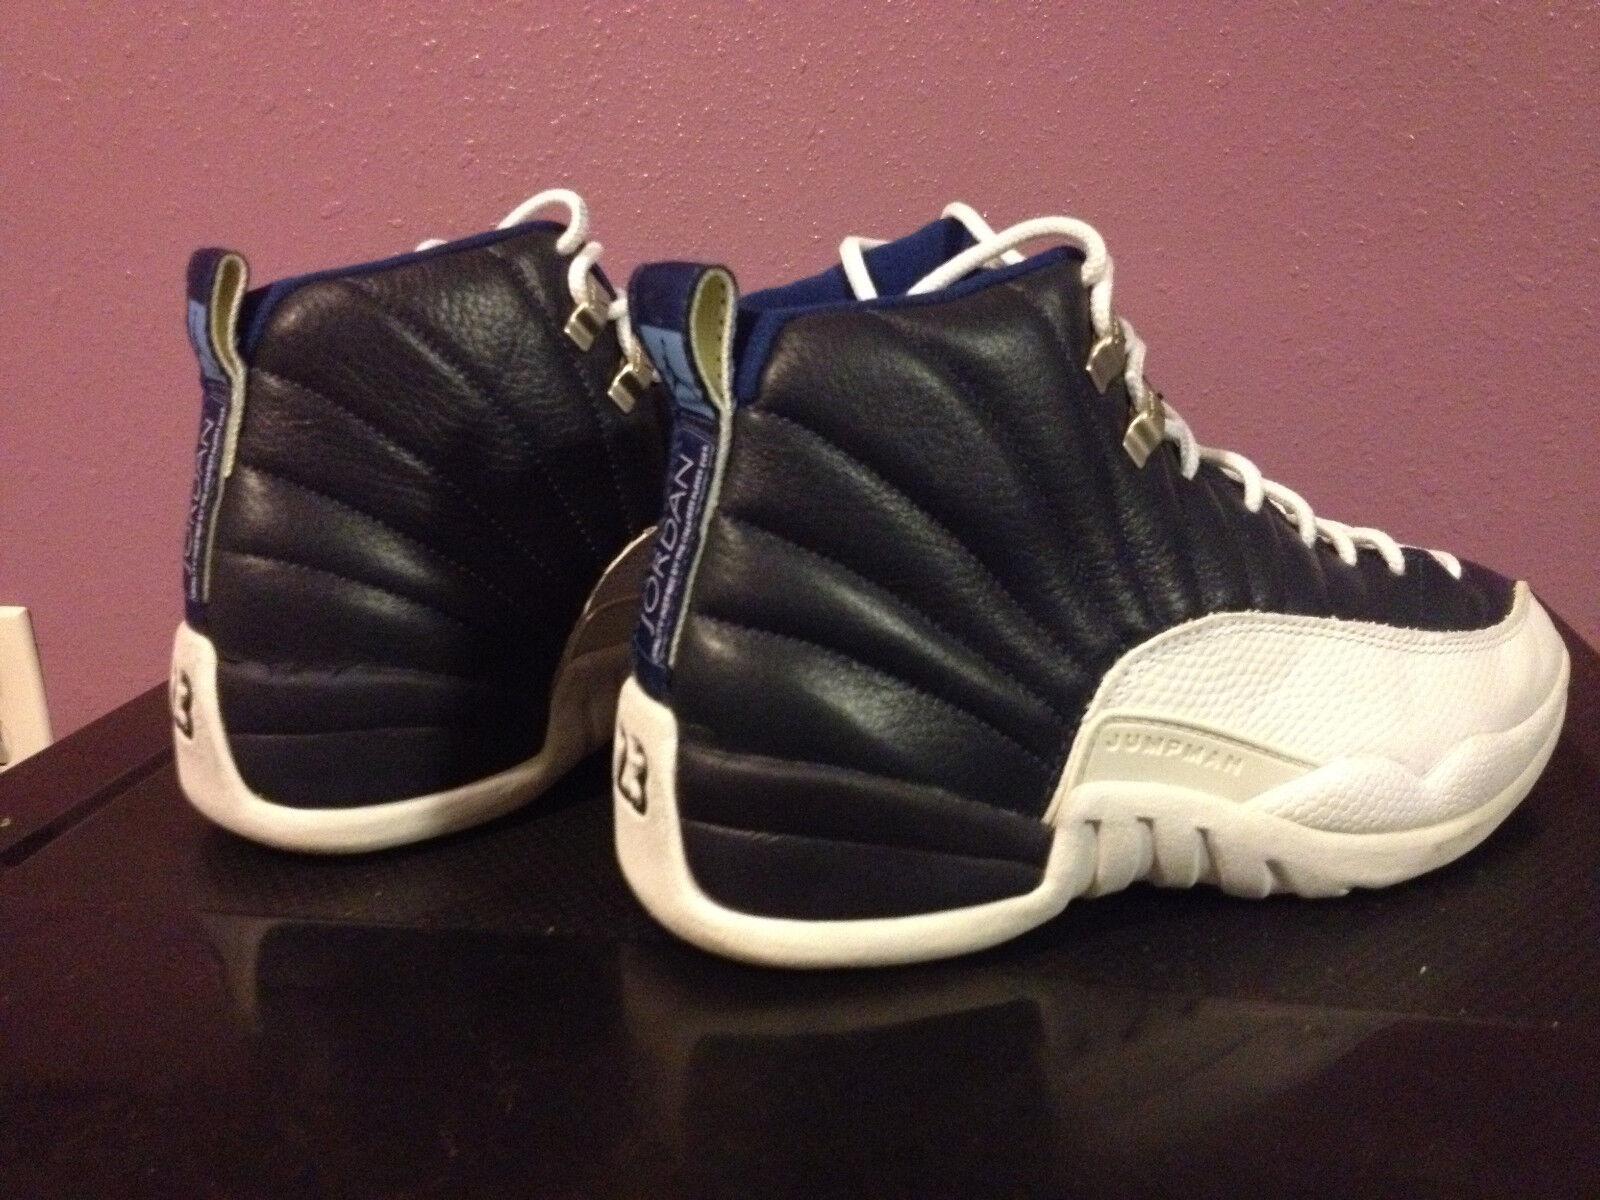 Nike air jordan rari originale xii 12 ossidiana bianco blu 8